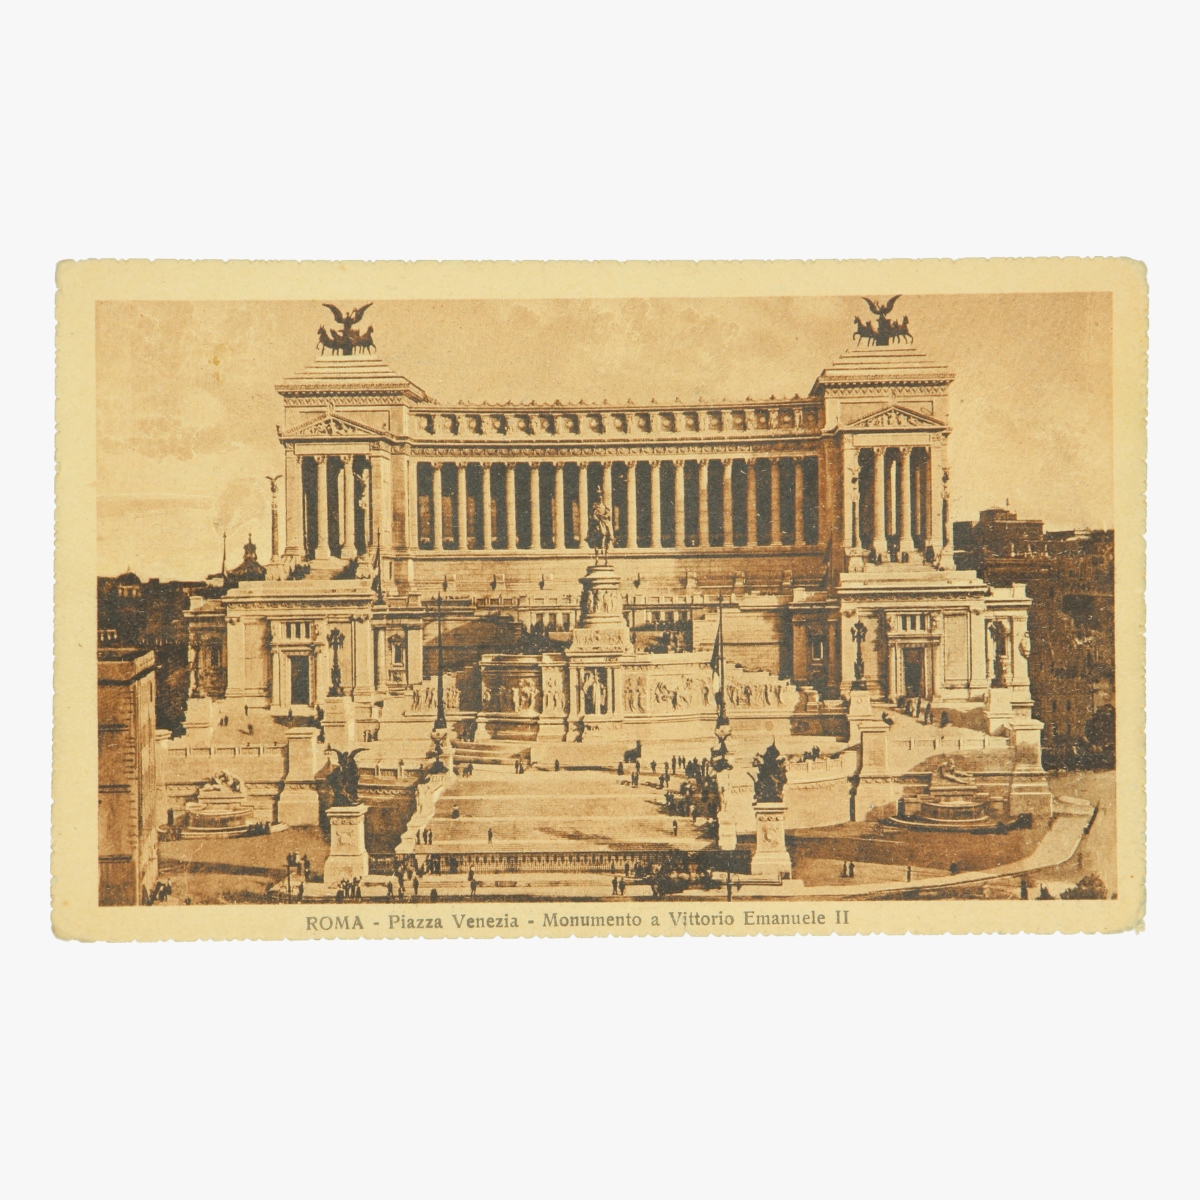 Afbeeldingen van Roma-Piazza Venezia. Monumento a Vittorio Emanuele II. Postkaart Nr. 034-21